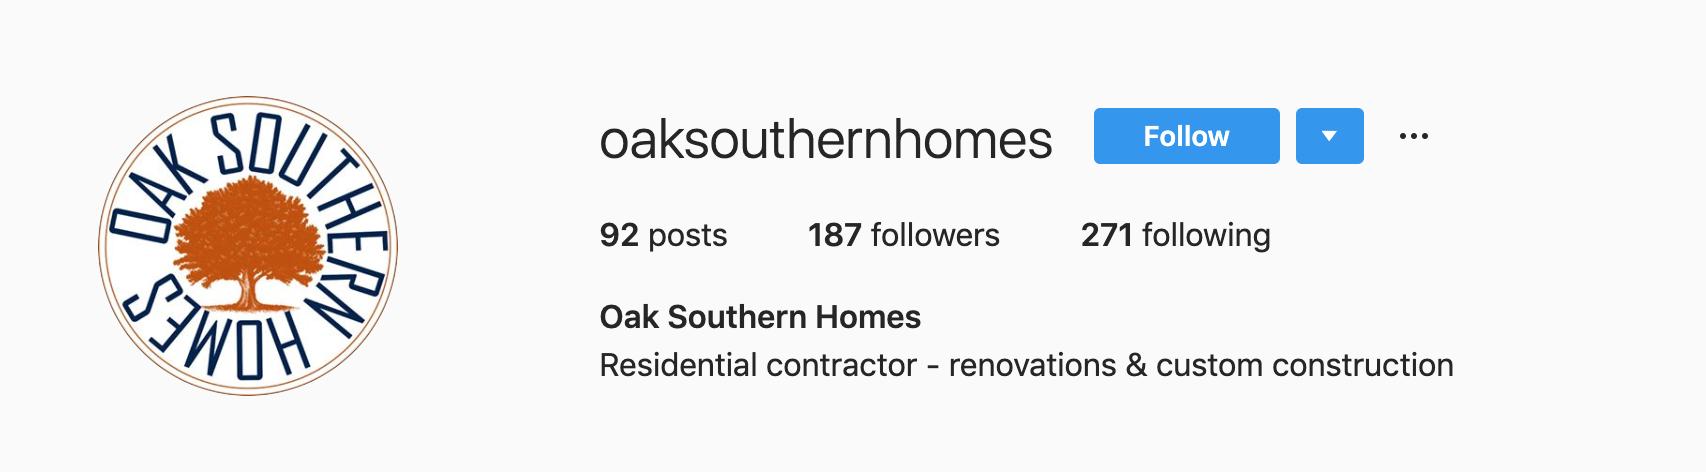 Oak Southern Homes Instagram Bio